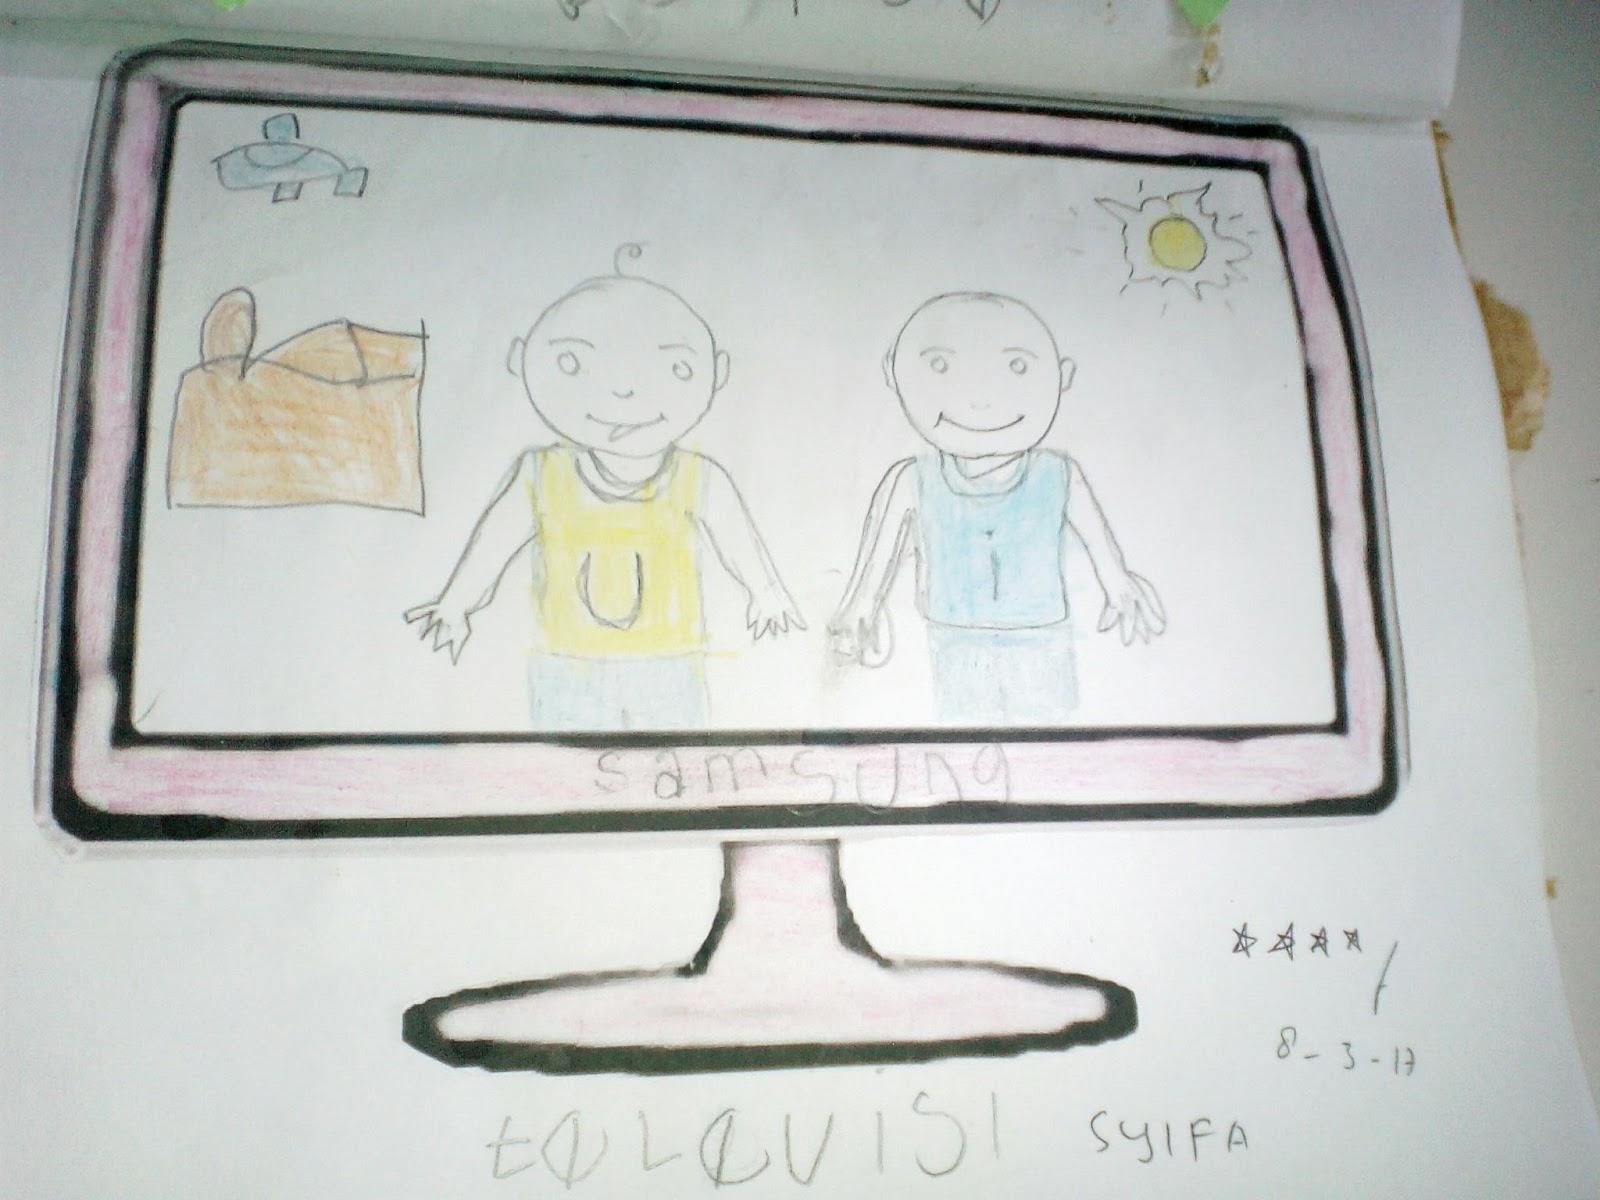 Menggambar Mewarnai Menggunting Gambar Televisi Tk Islam